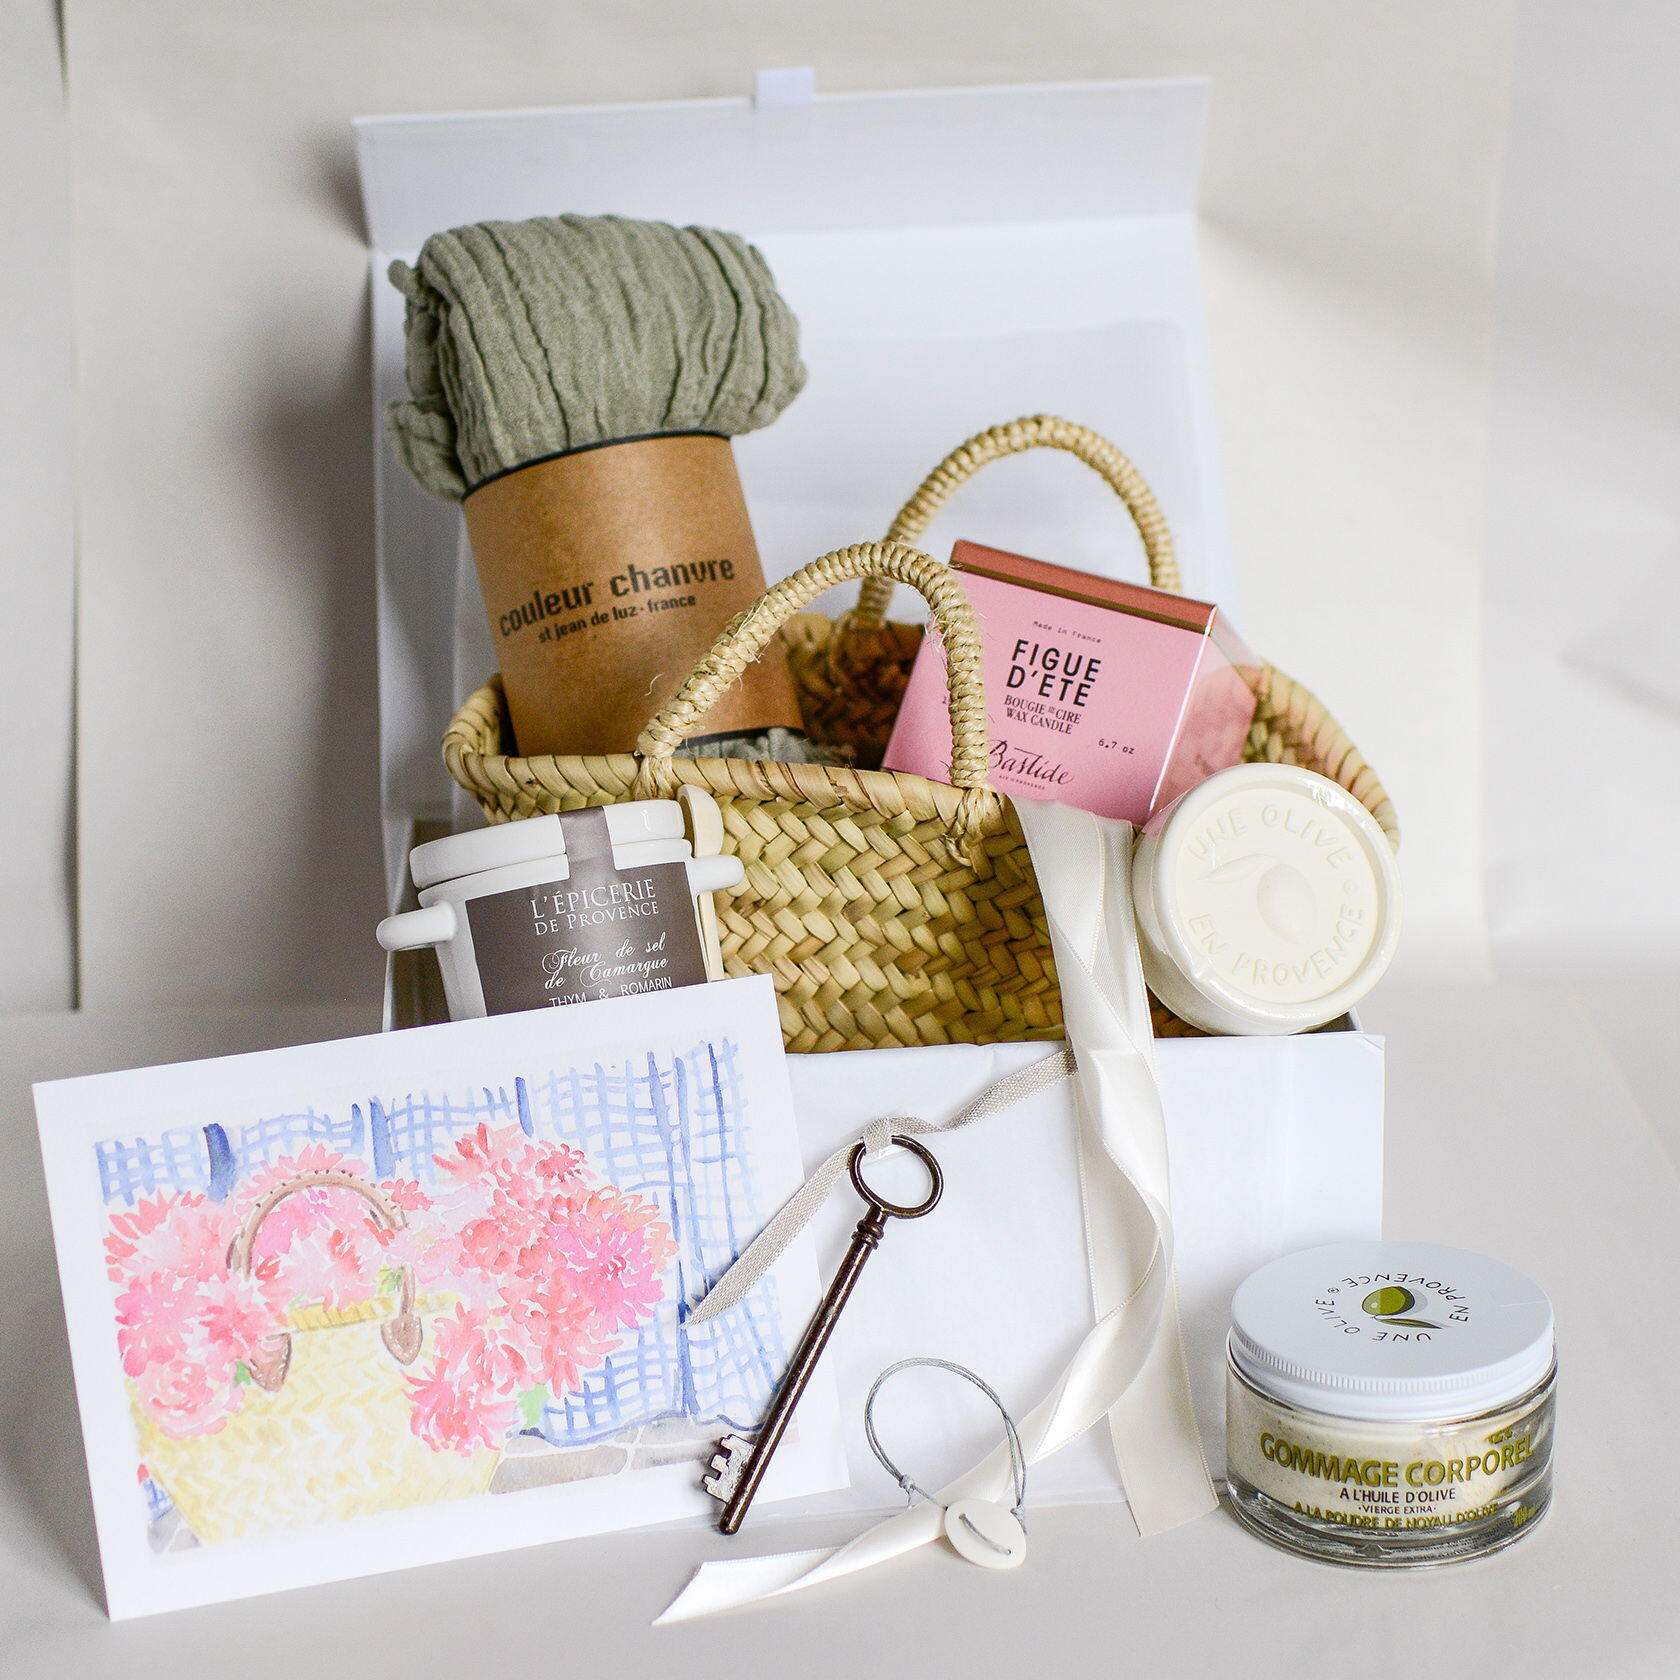 My Stylish French Box August 2017